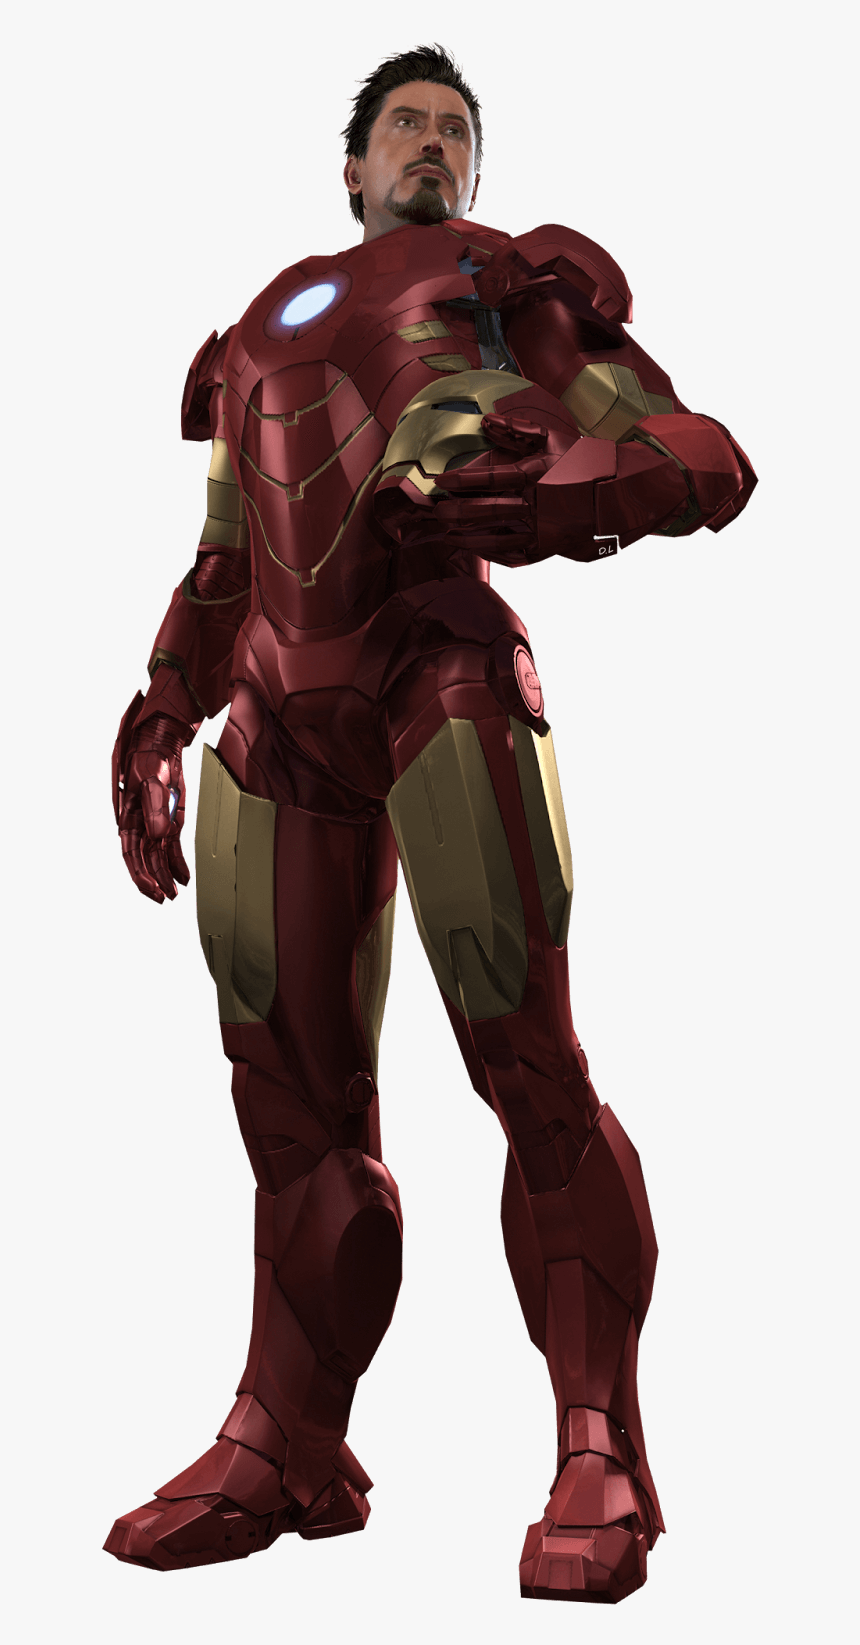 Ironman Png - Tony Stark Iron Man Png, Transparent Png, Free Download